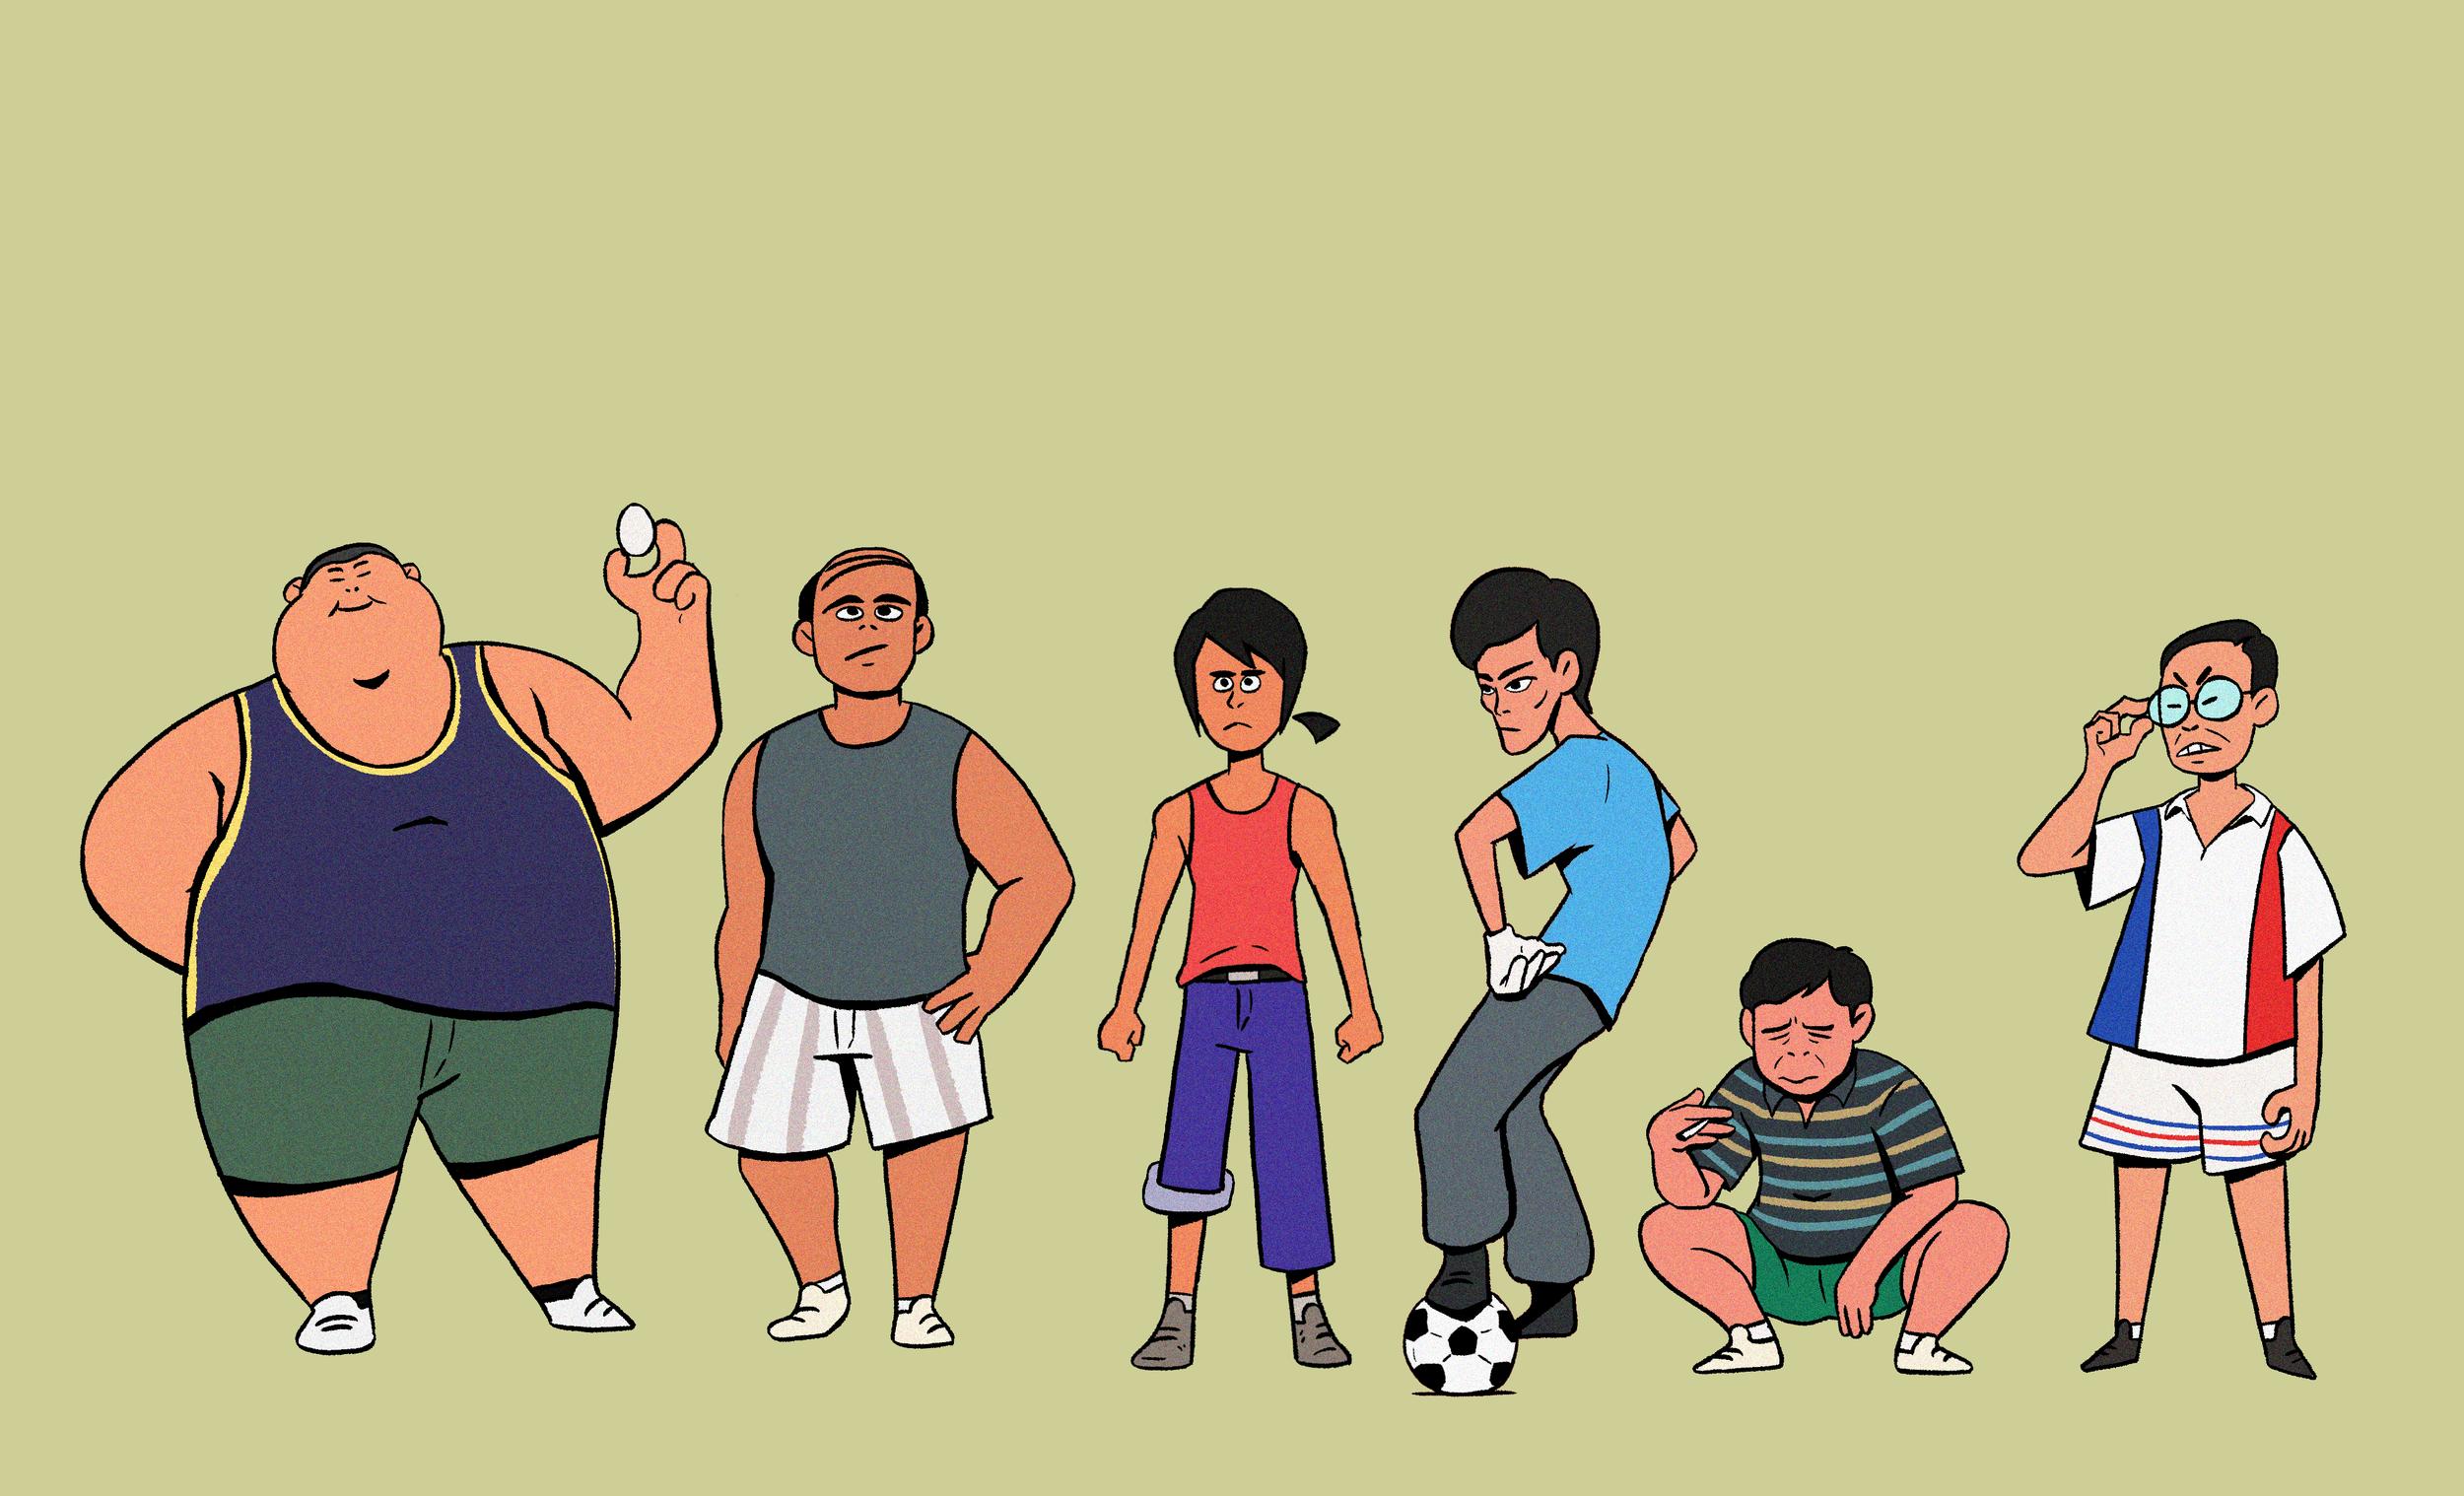 shaoline soccer.png